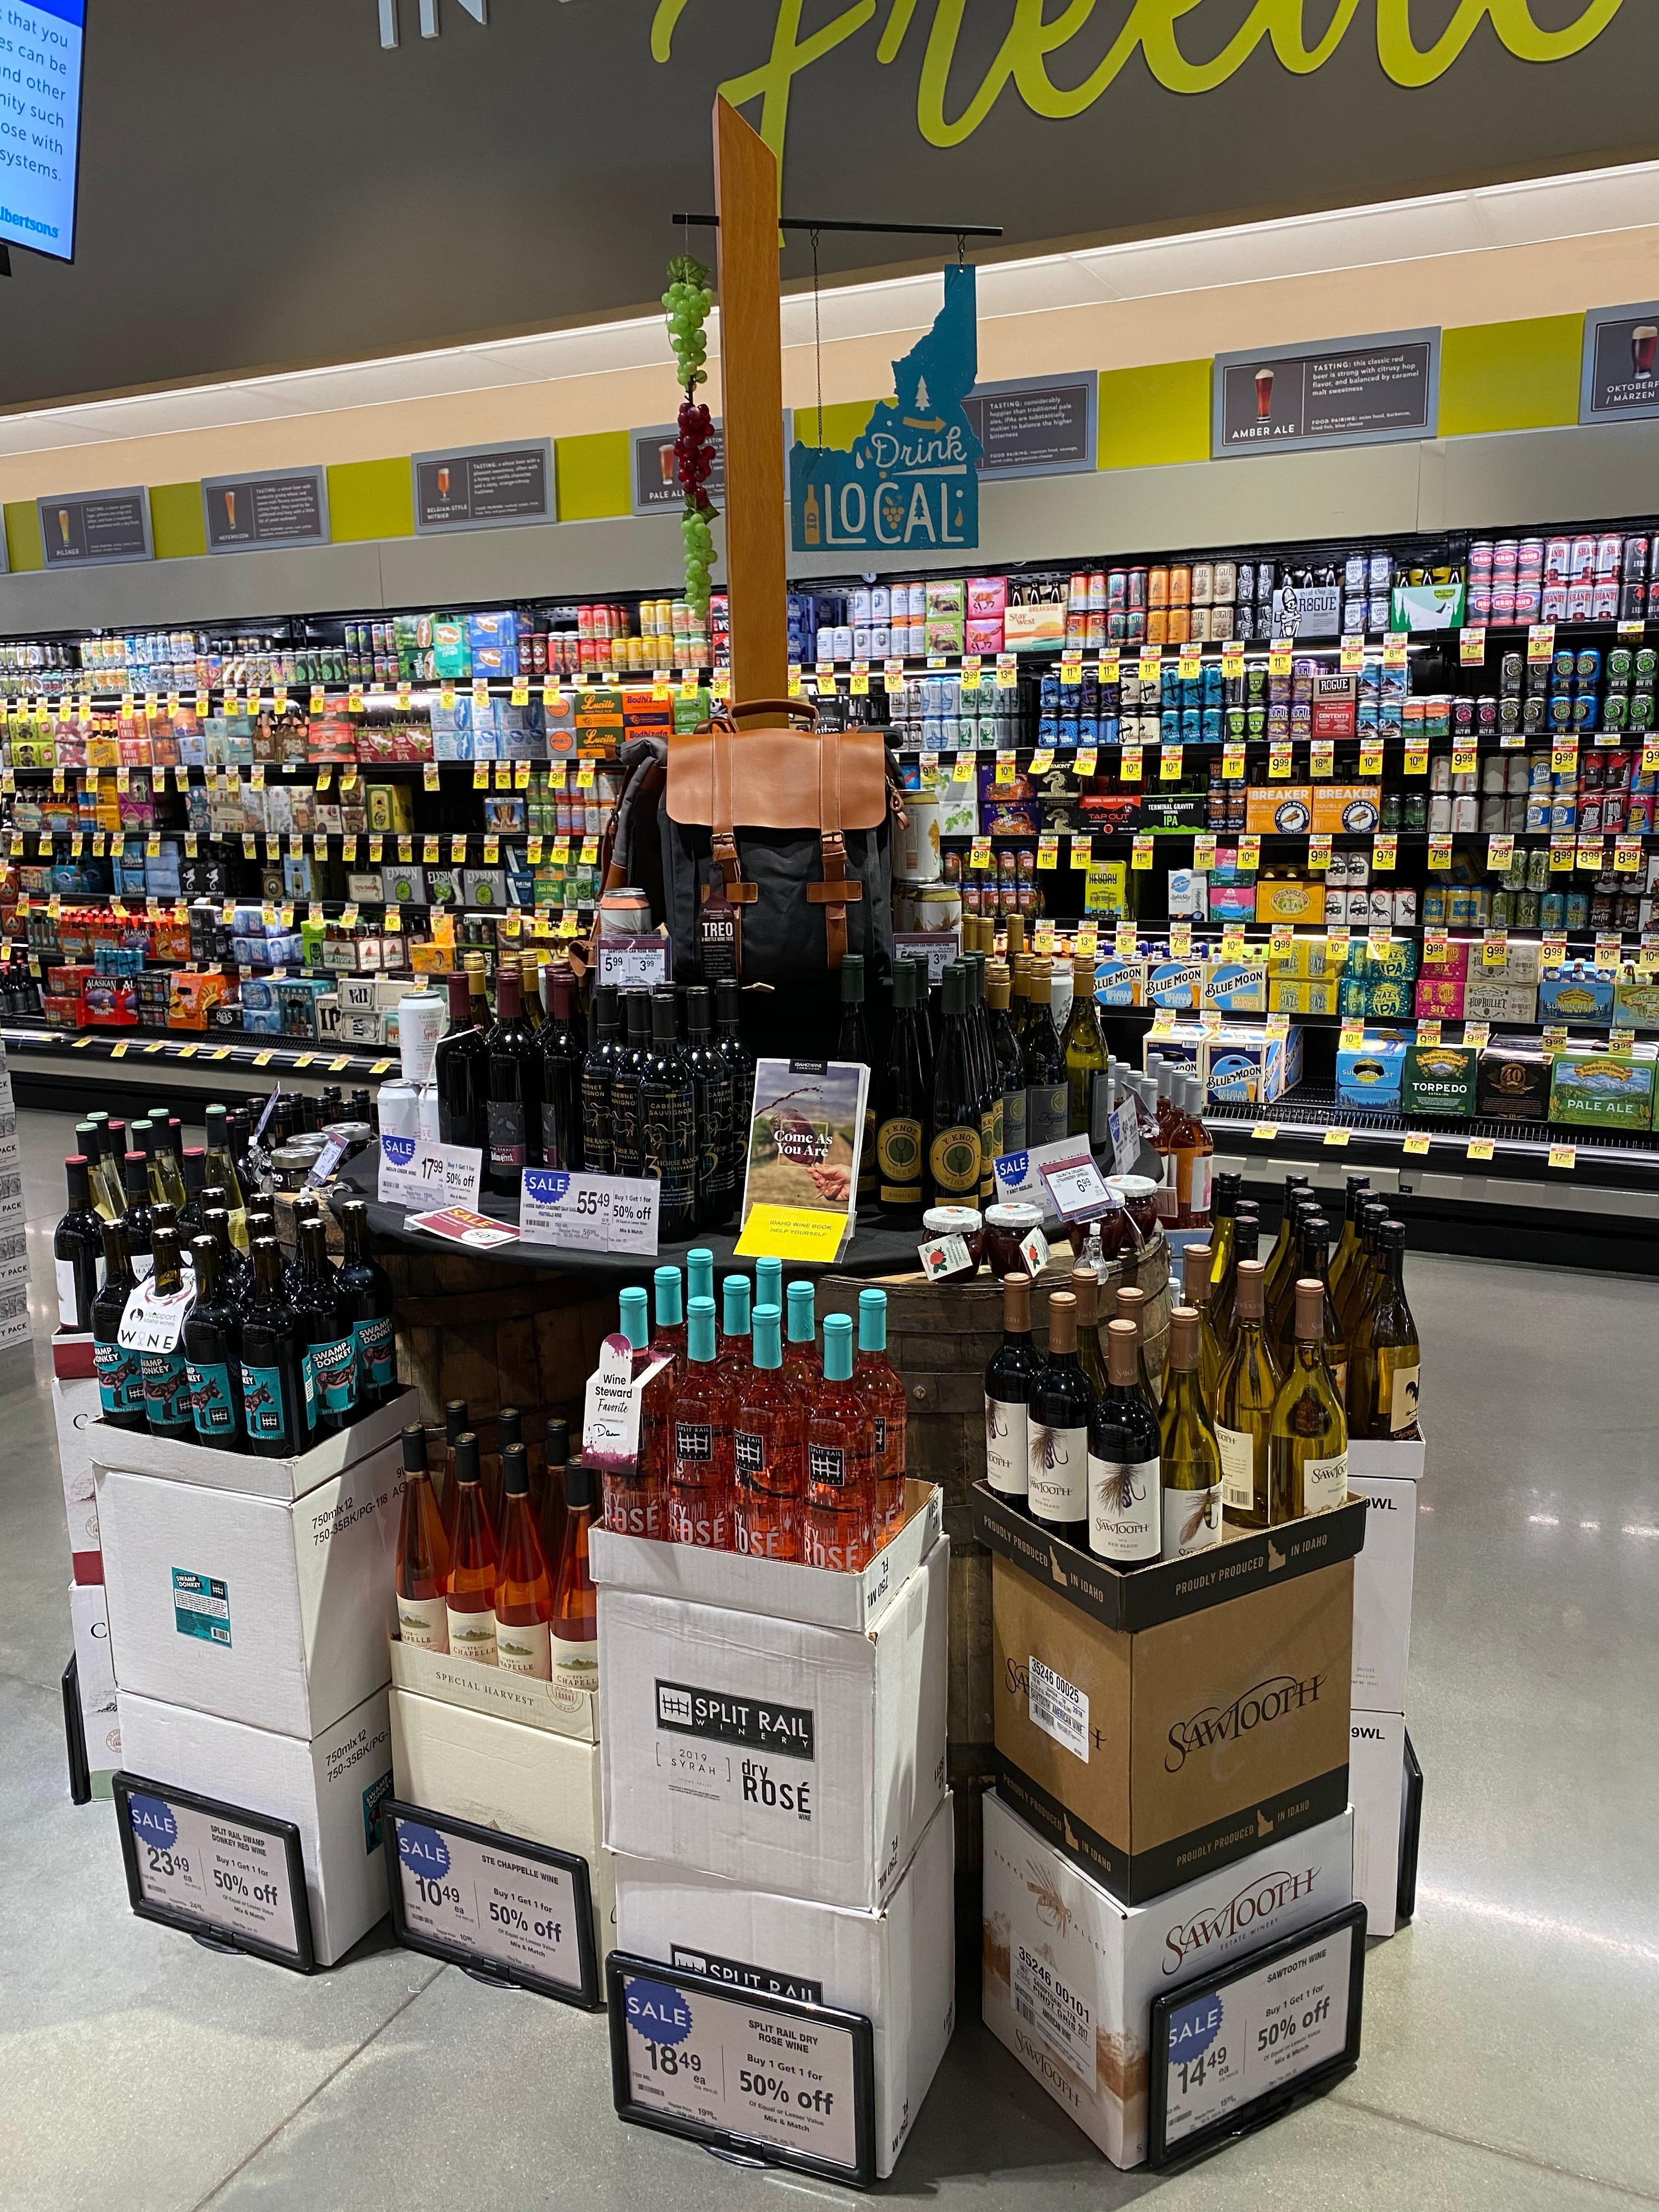 Idaho Wine at Albertsons